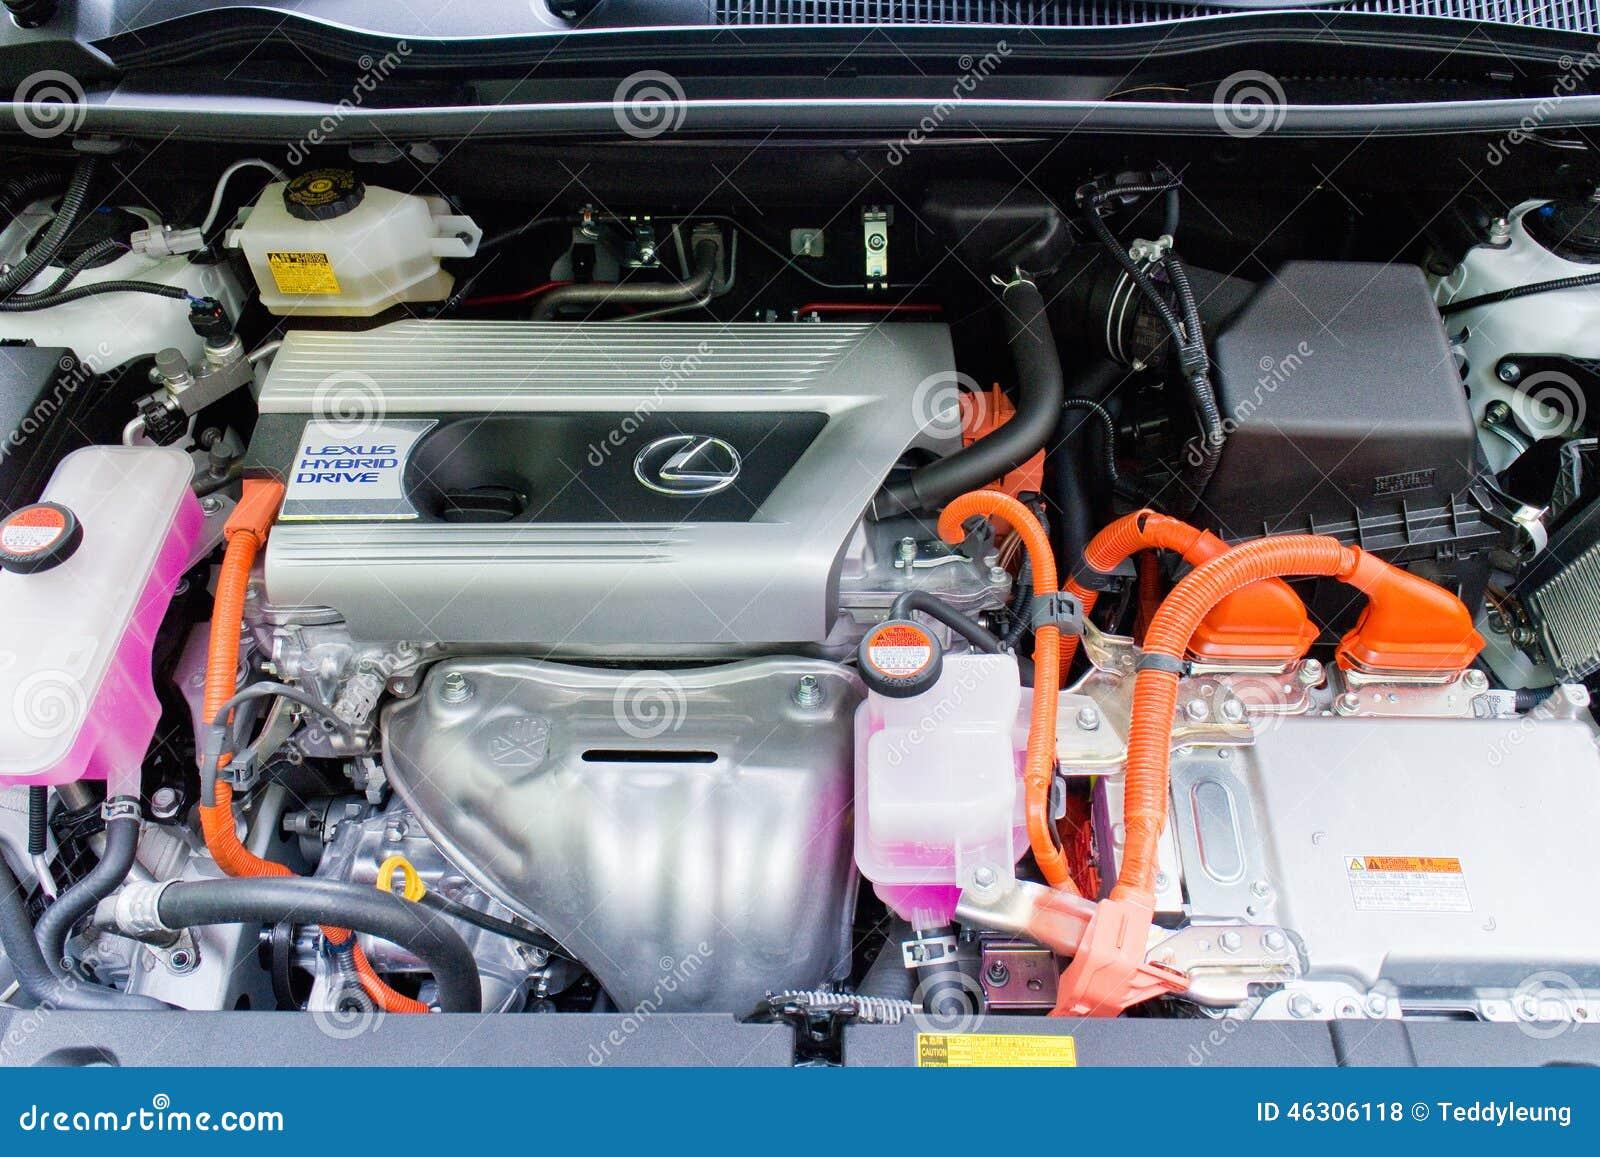 Lexus NX 300h Hybrid Engine Editorial Stock Photo - Image ...